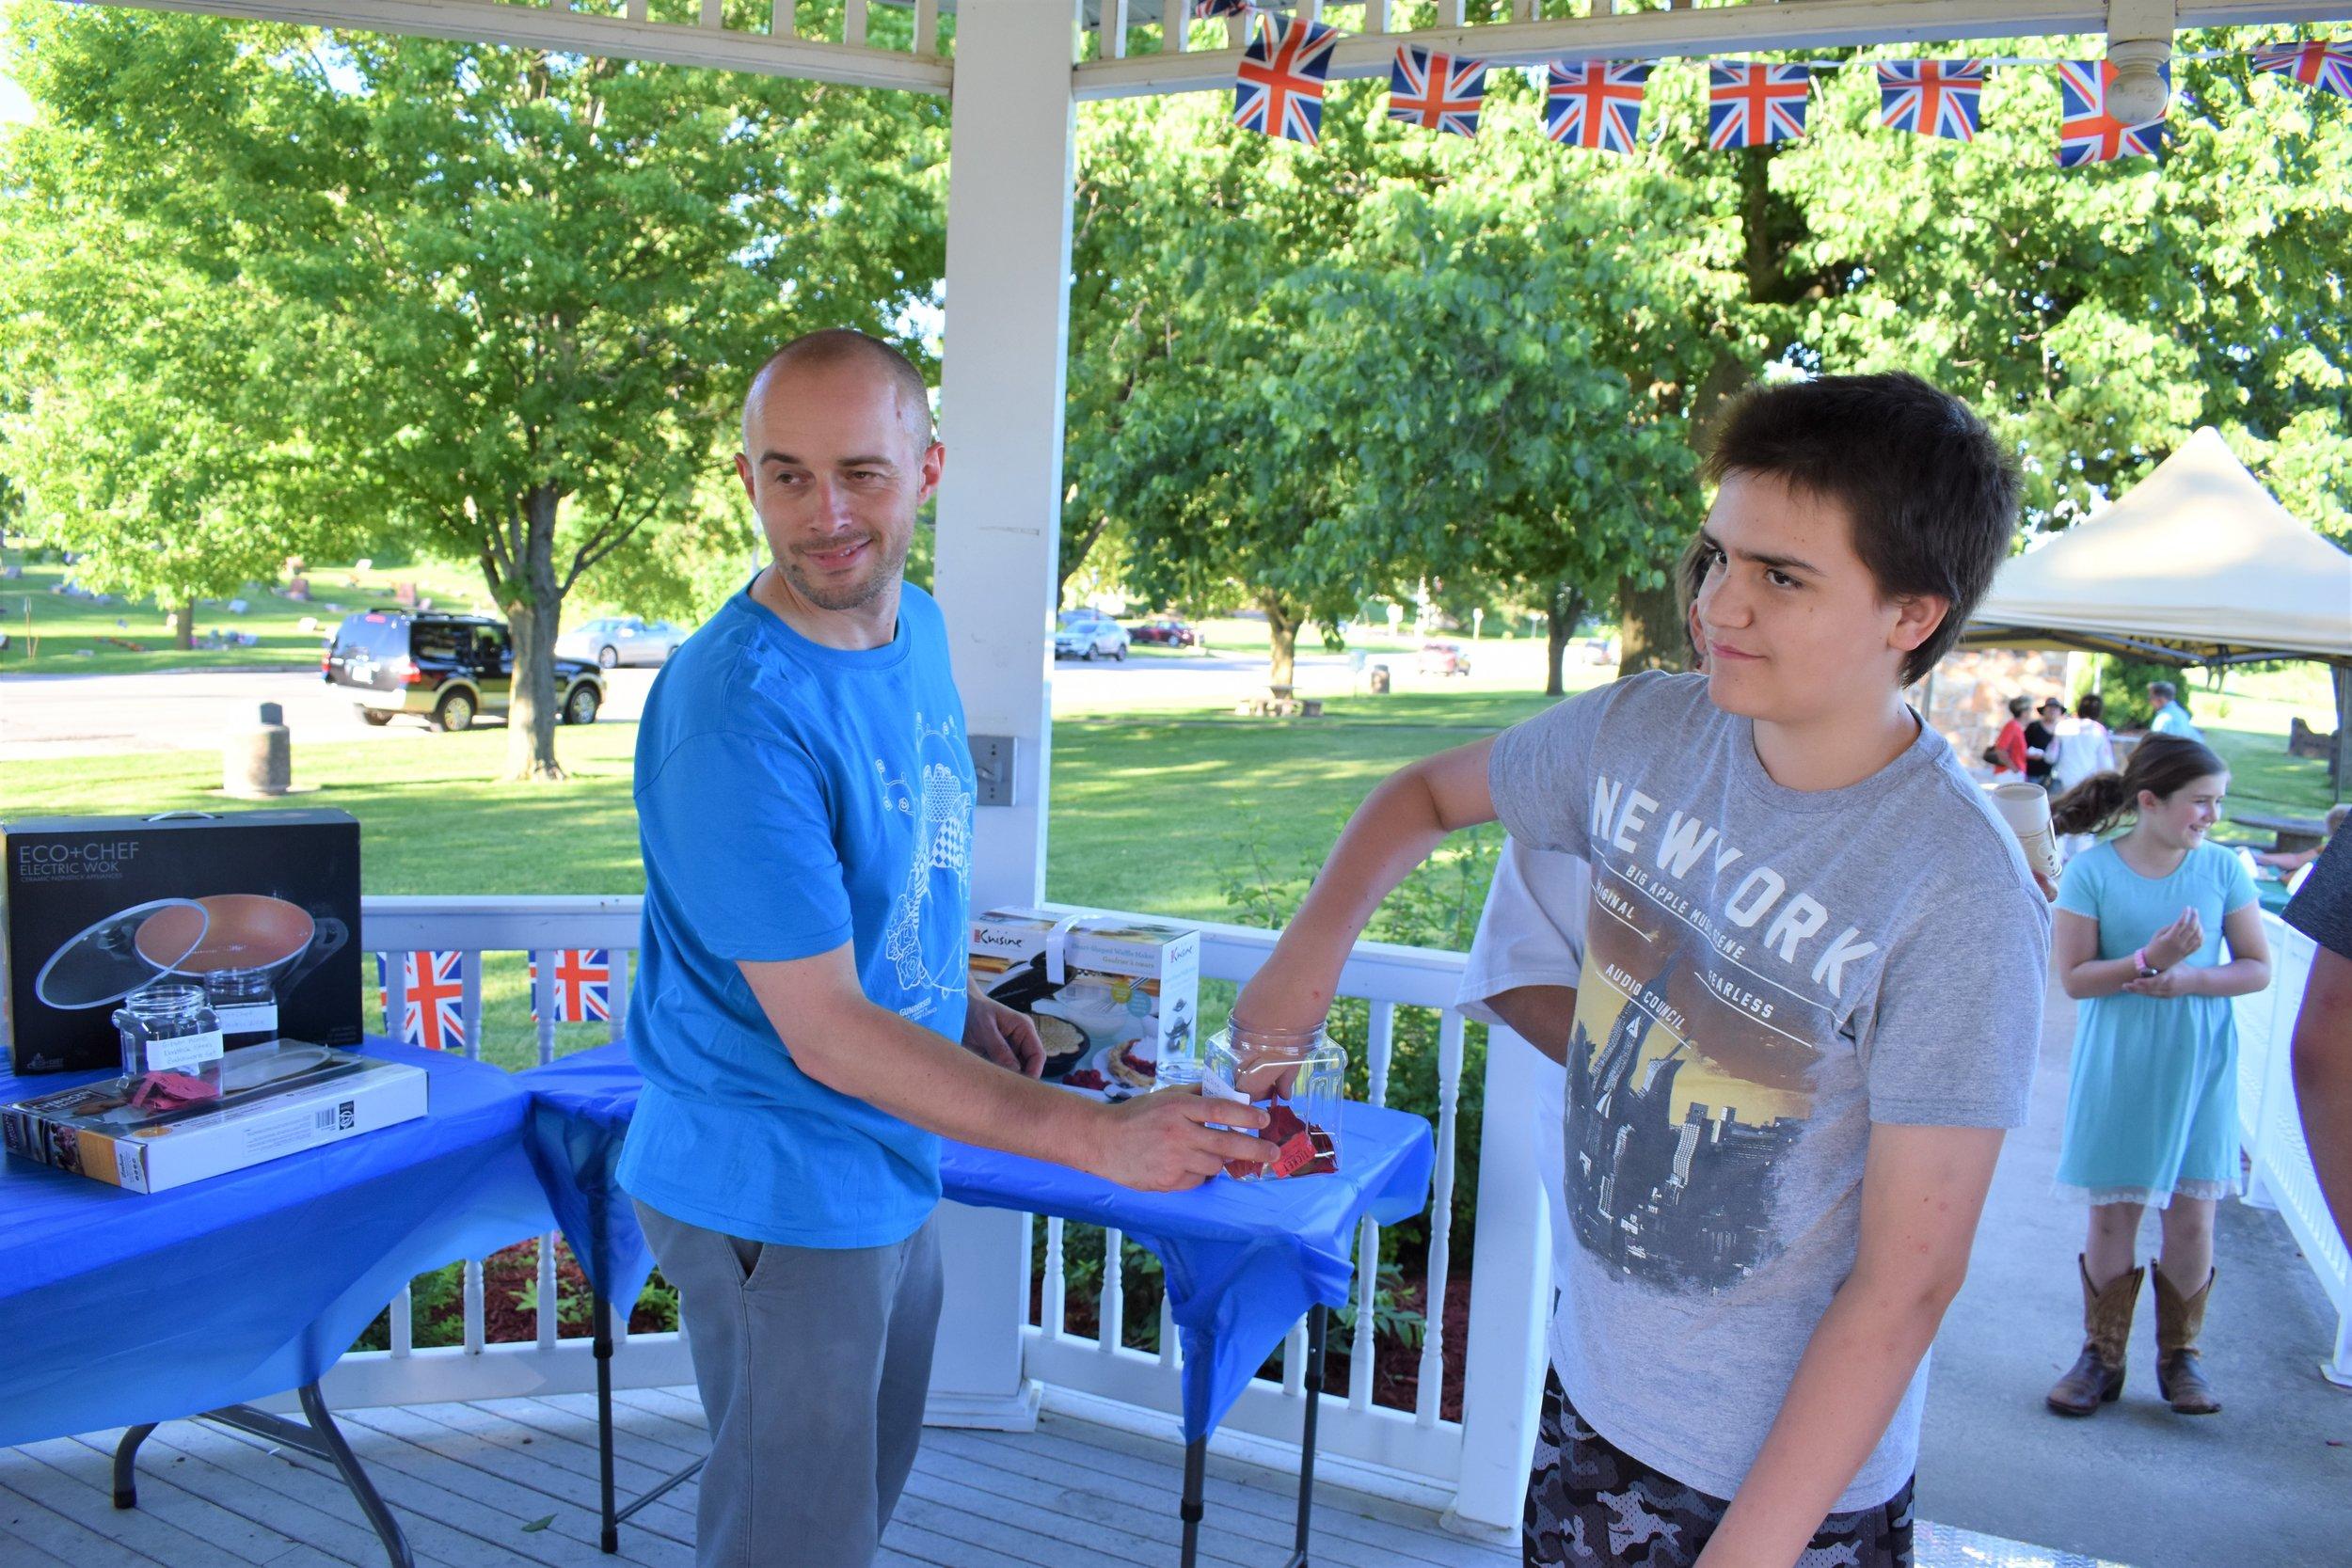 Dan Howard has Nathan Smalley draw the winning raffle tickets